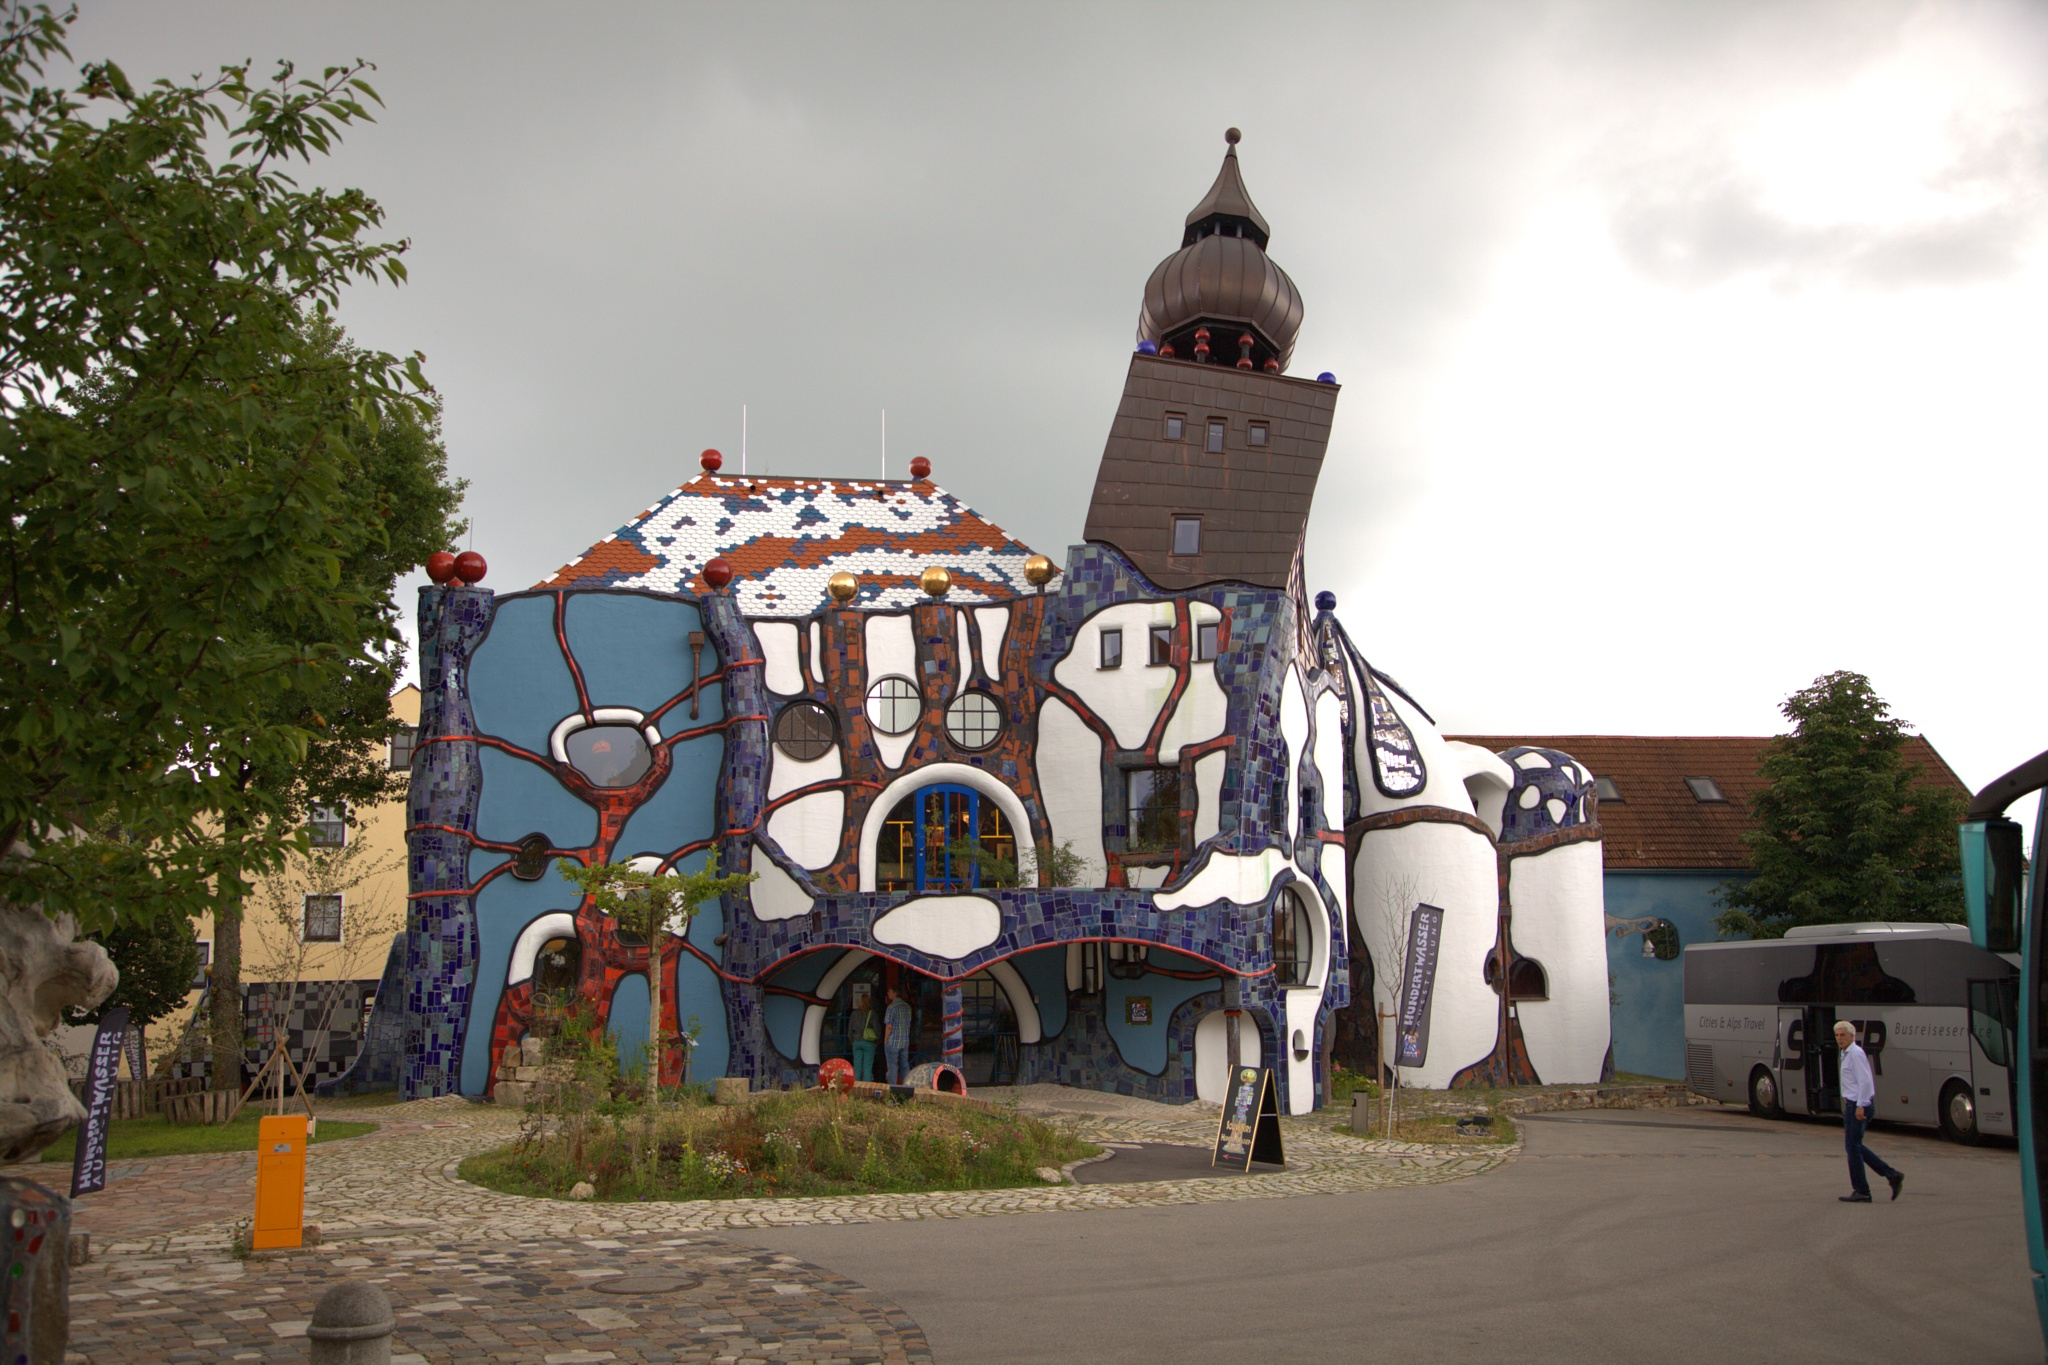 Hundertwasser-museum by Rolf-Dieter Balindt